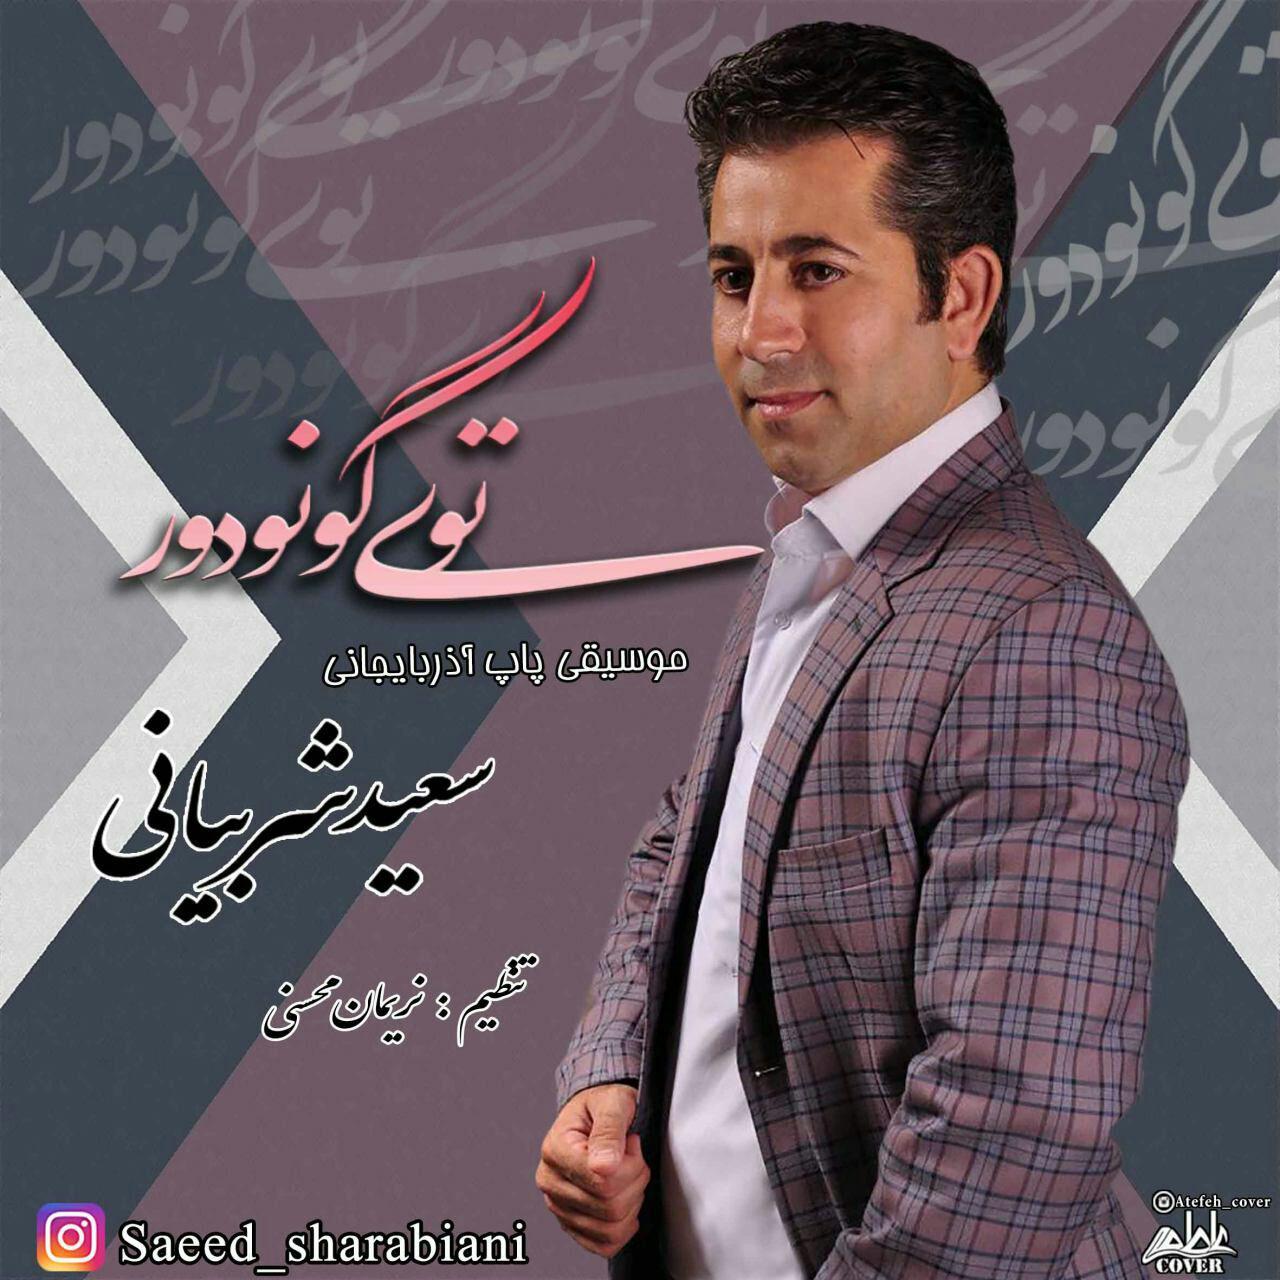 http://s8.picofile.com/file/8300915700/072Saeed_Sharabiani_Toy_Gunudur.jpg